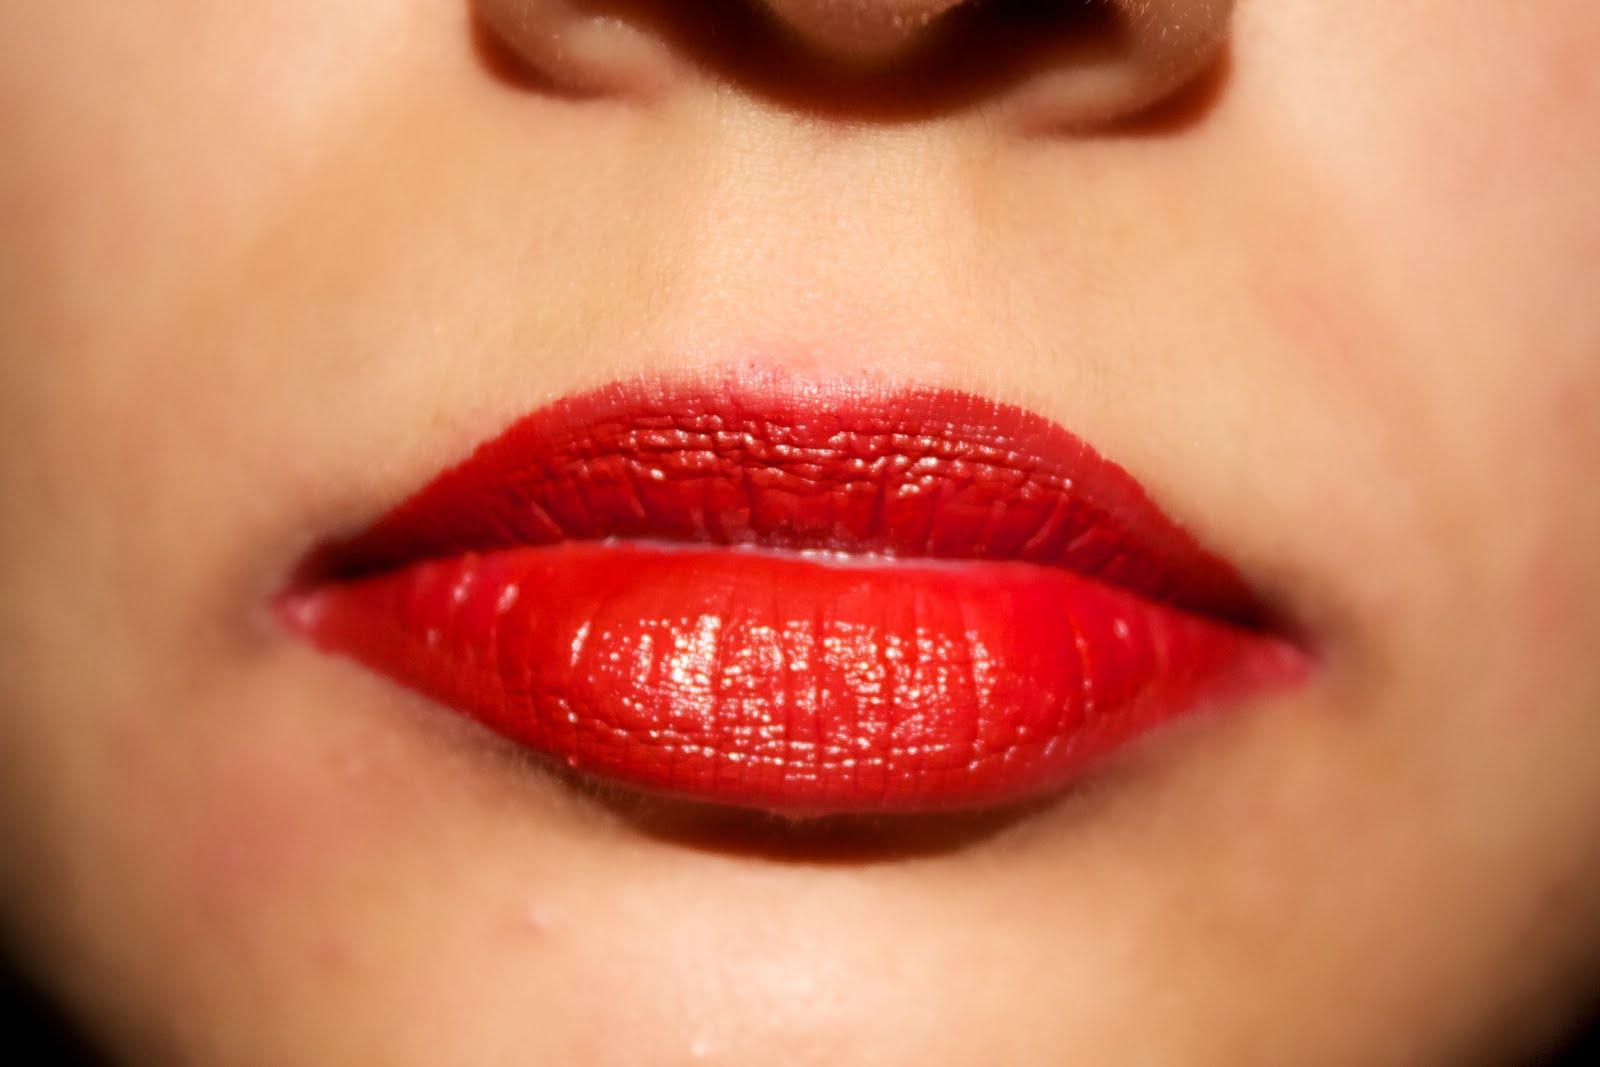 twinxntrax nyx round lipstick swatches part 1